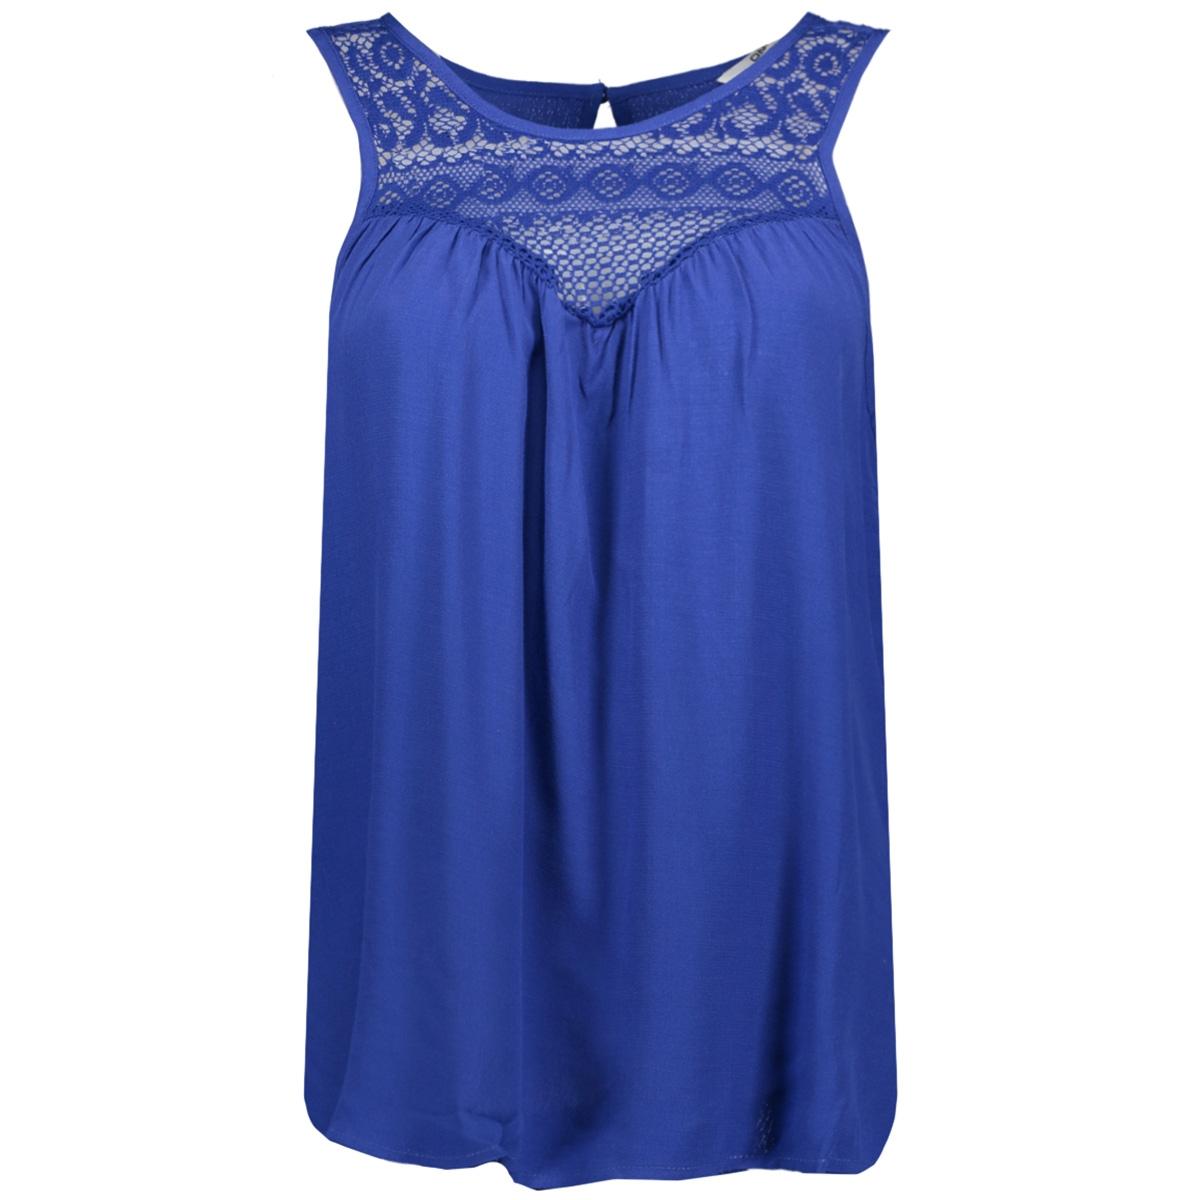 onlvide s/l top wvn 15205383 only top mazarine blue